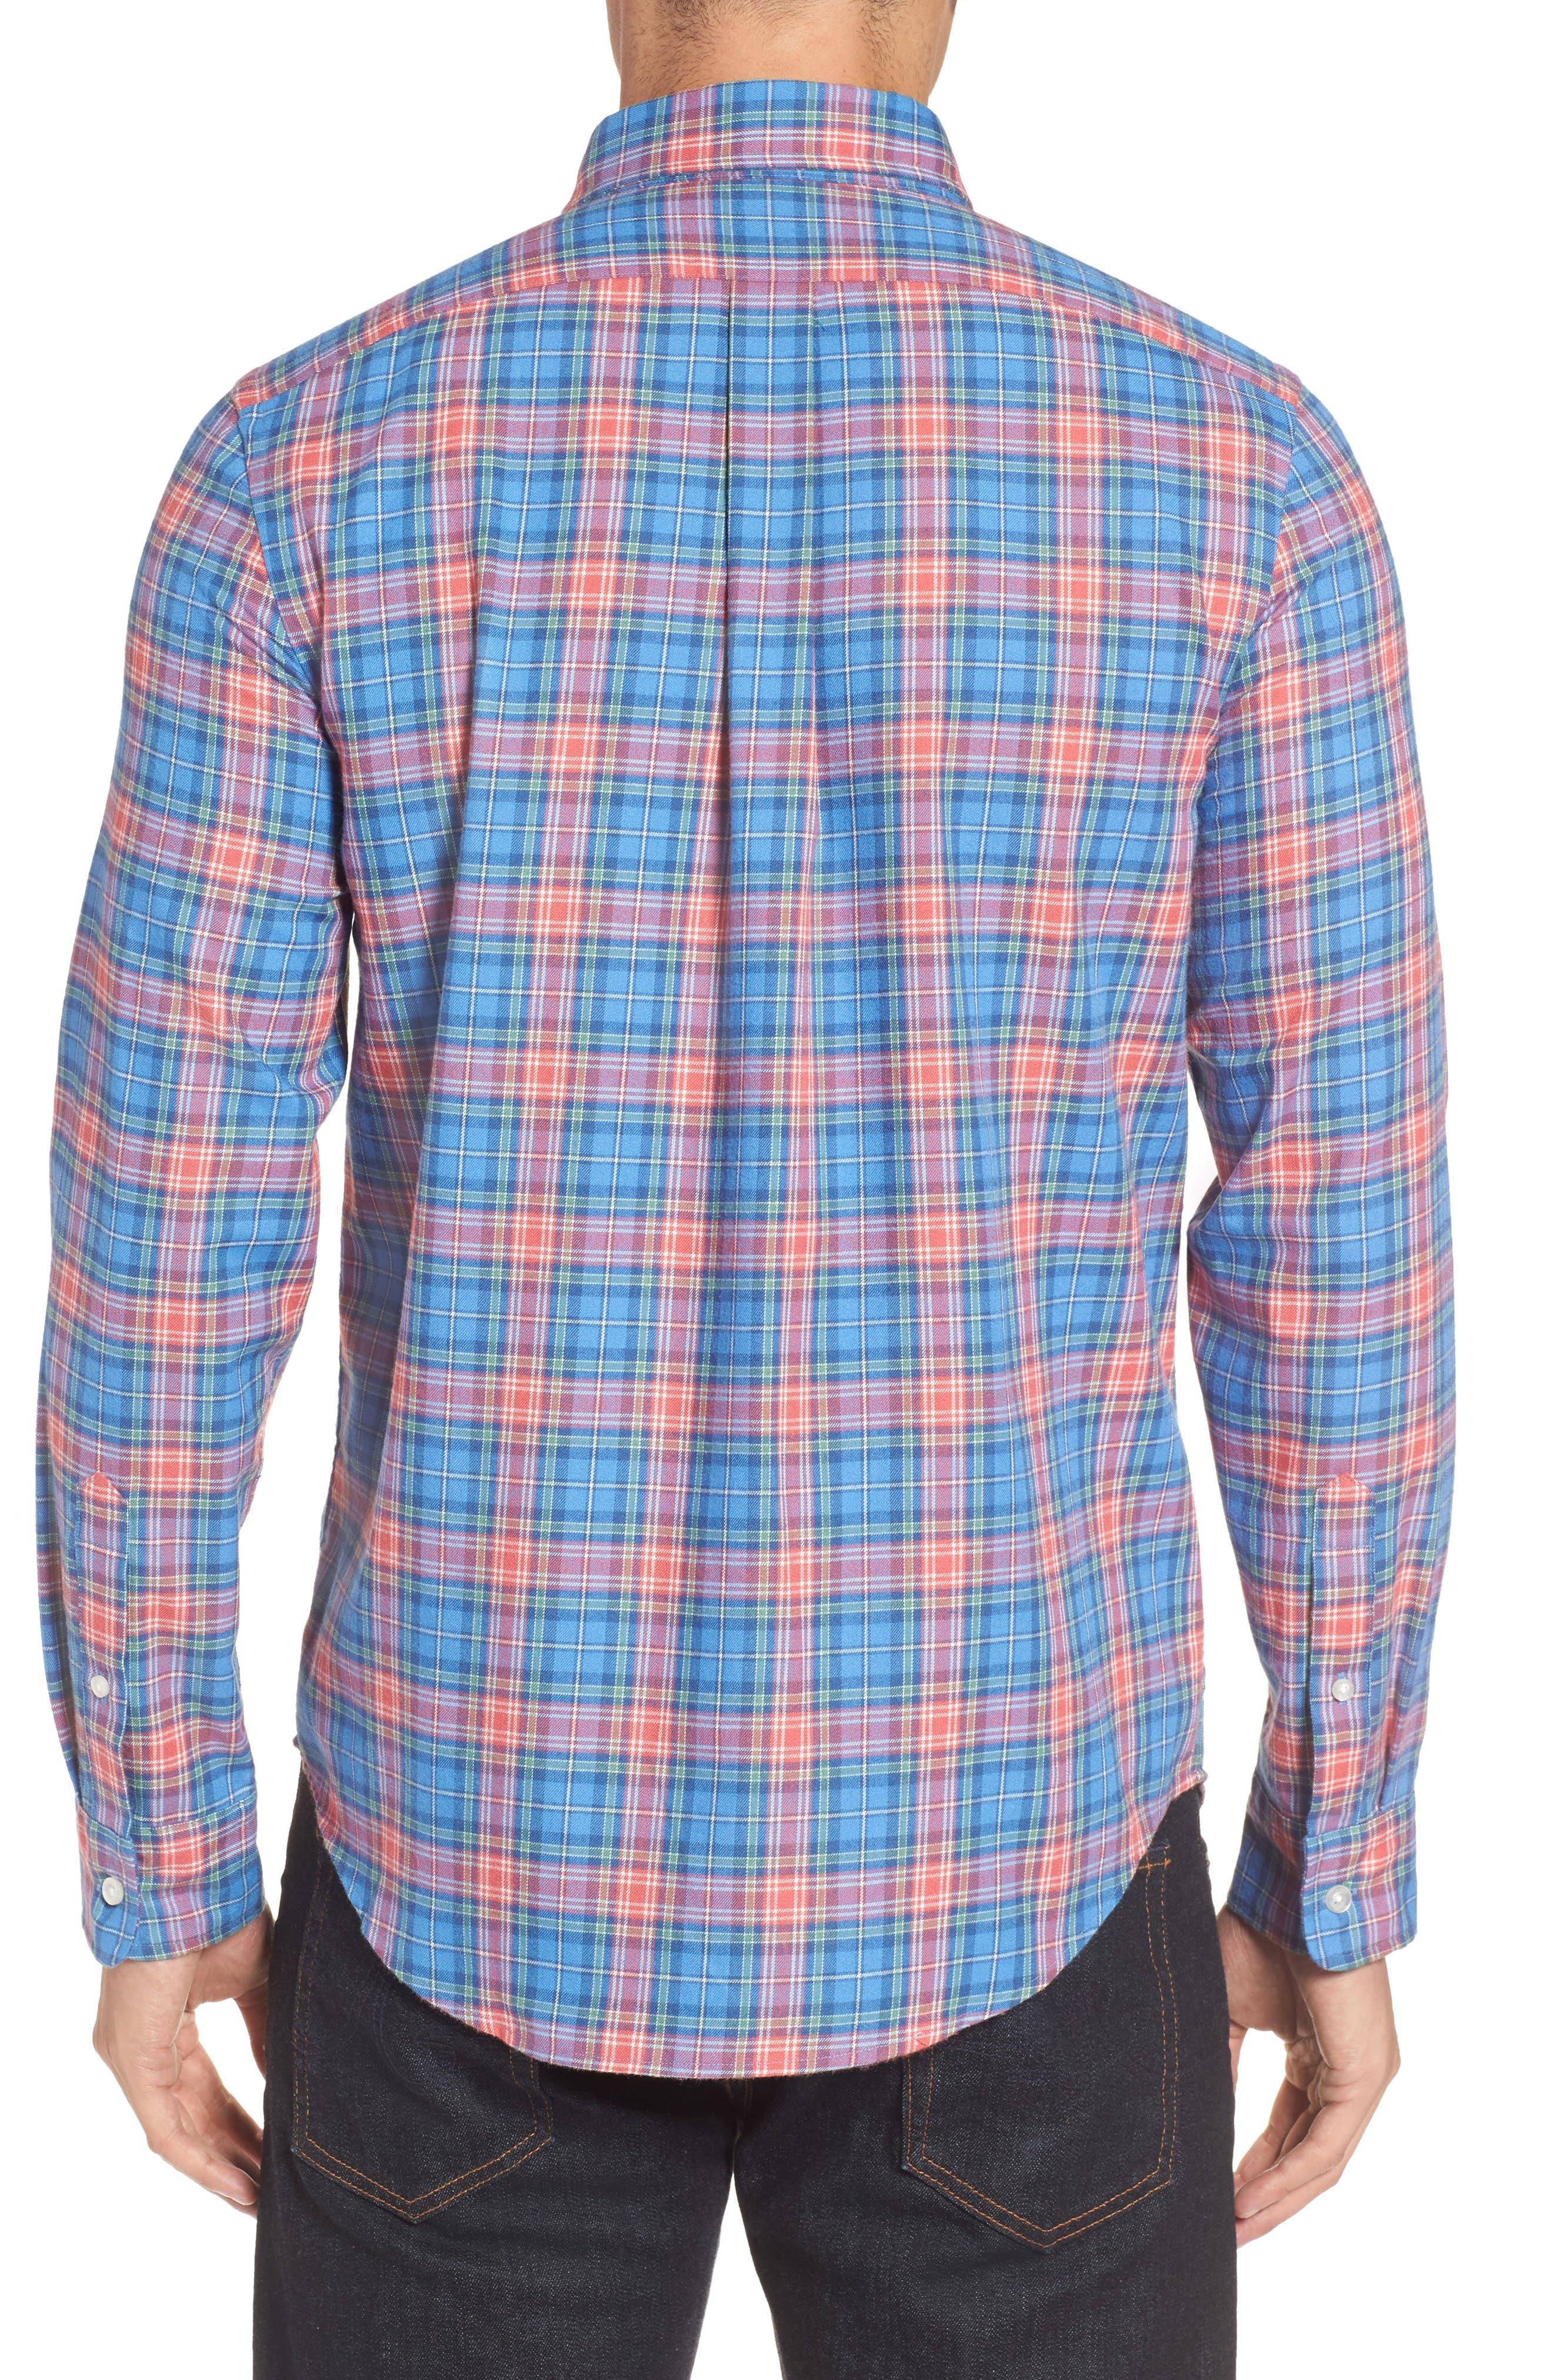 Kingsley Park Slim Fit Plaid Sport Shirt,                             Alternate thumbnail 2, color,                             431